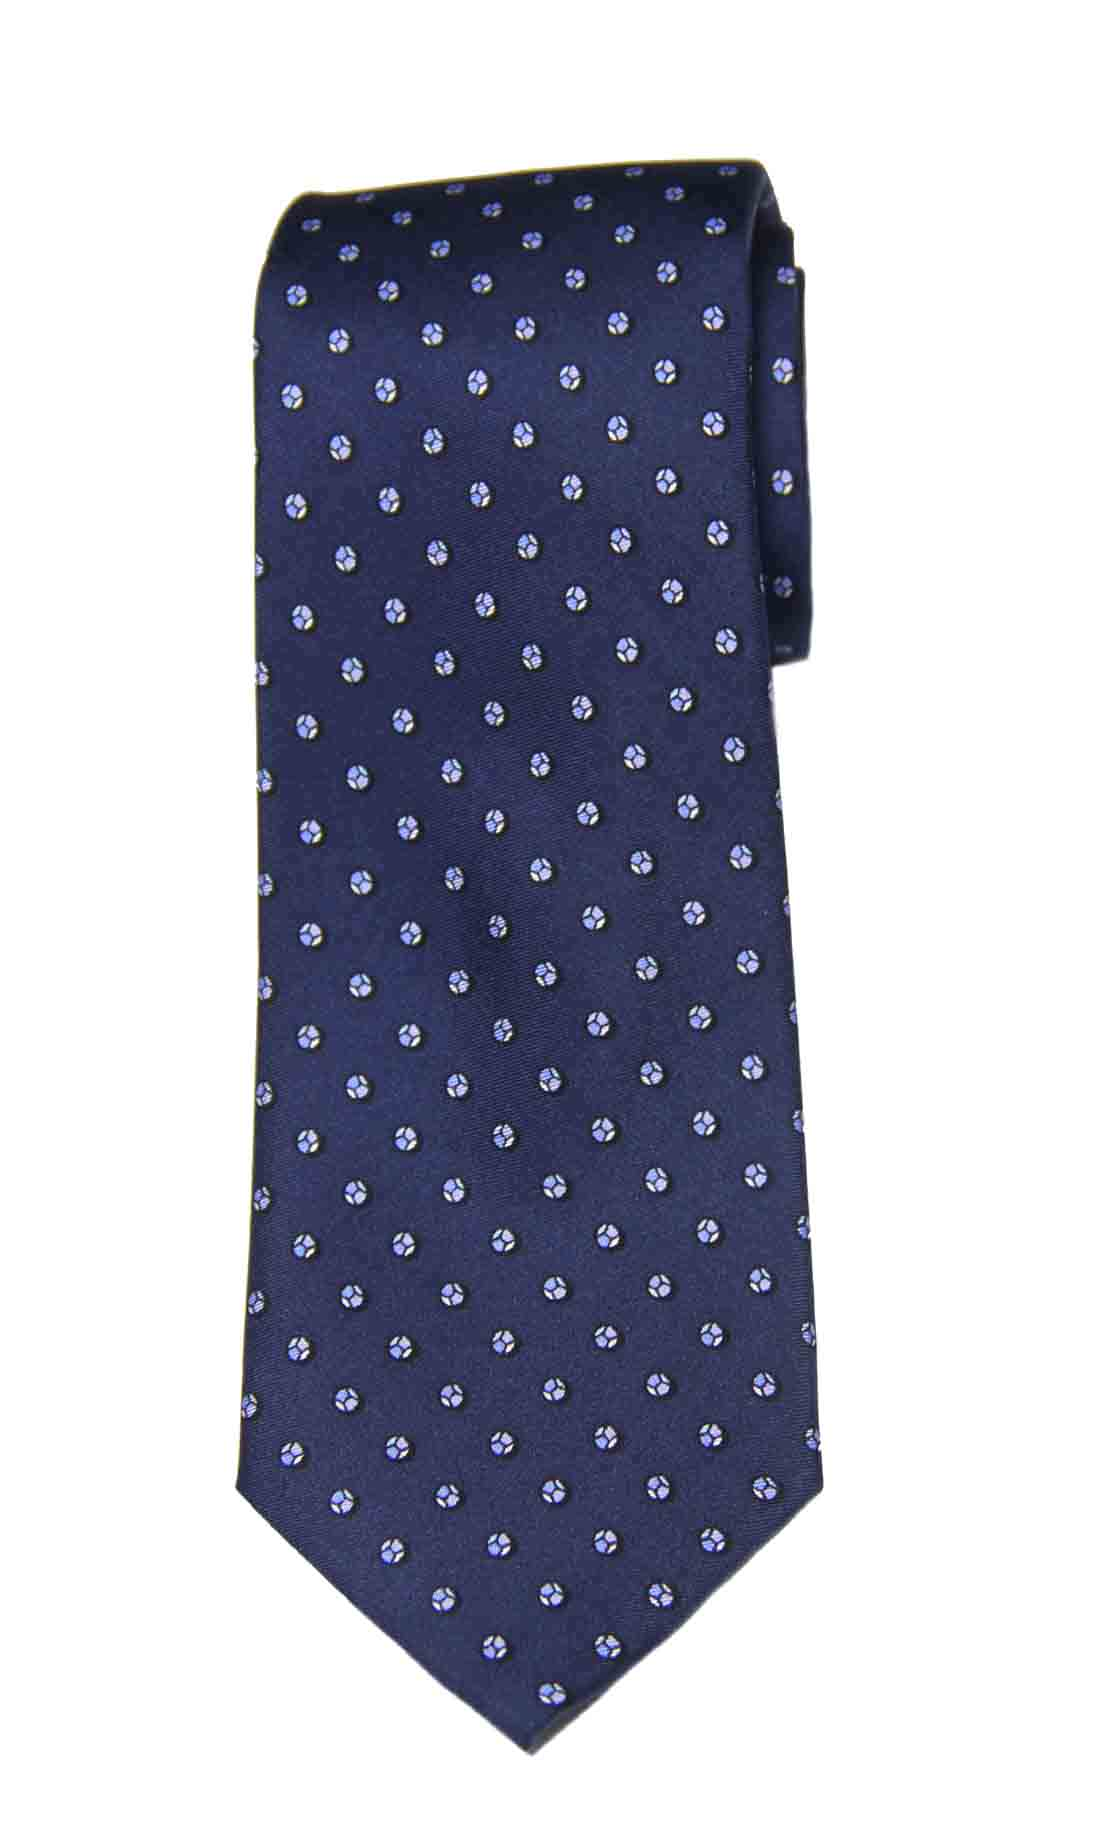 Michael Kors Silk Tie Navy Blue White Geometric Men's